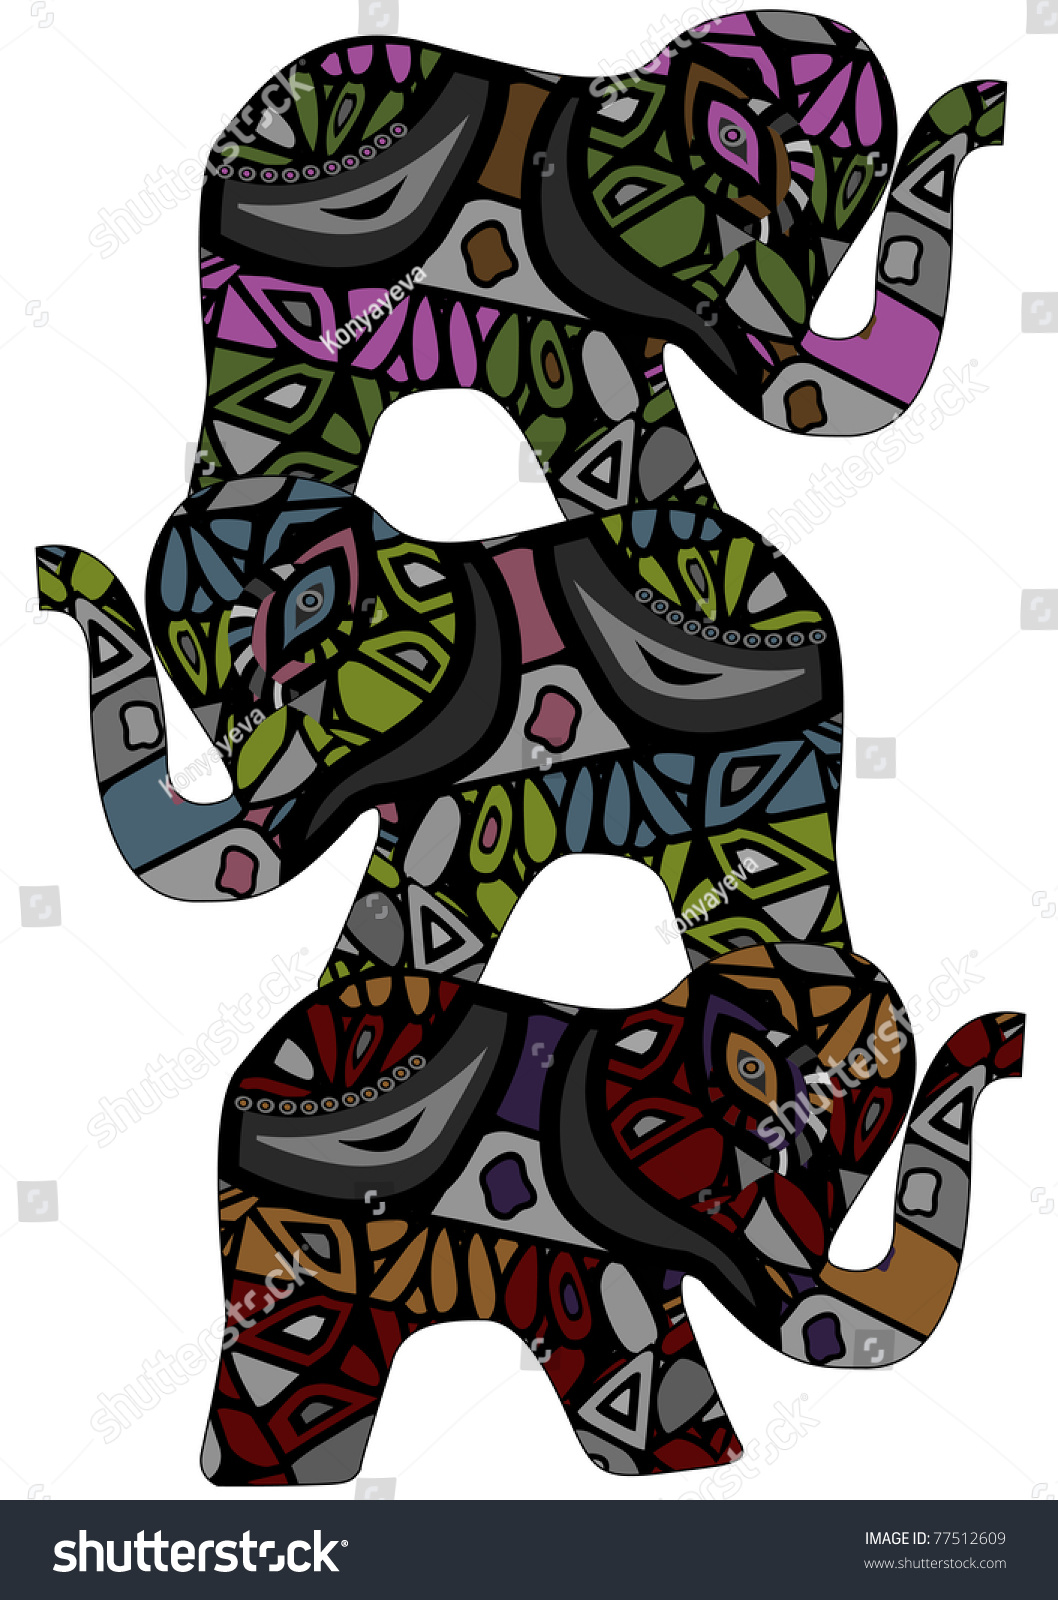 Elephants Symbol Good Luck The Elephants Stock Illustration 77512609